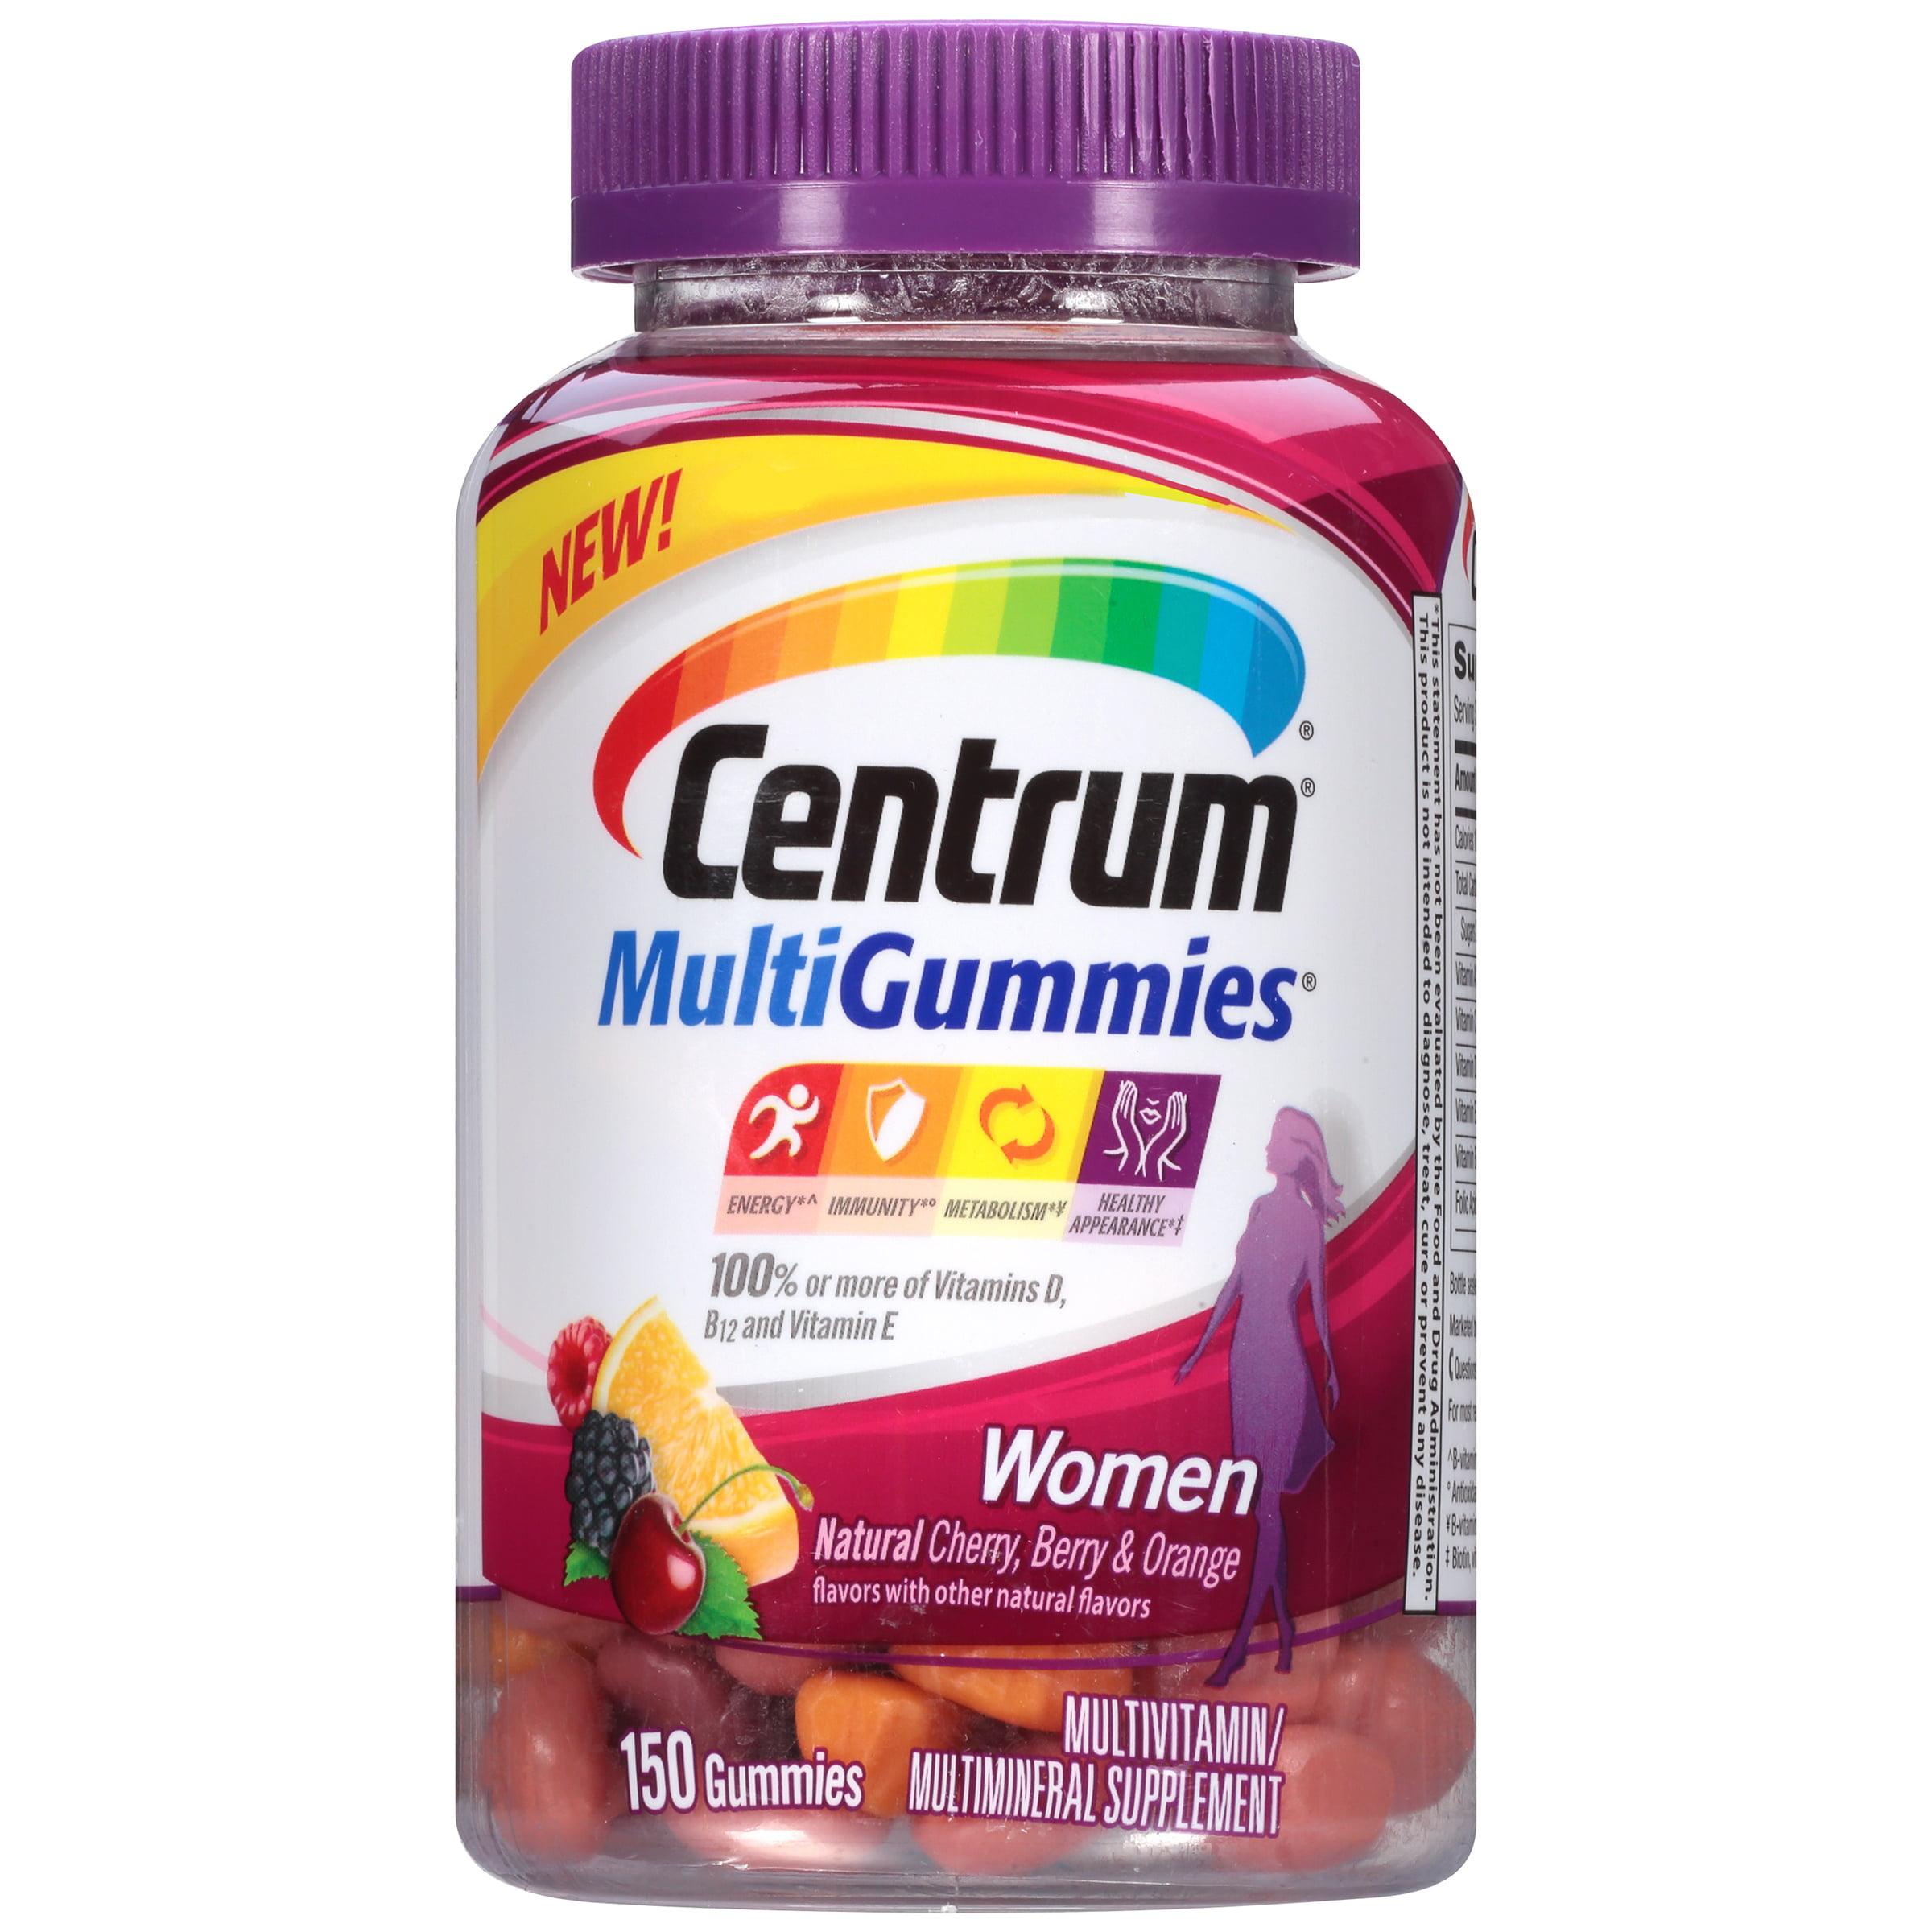 Centrum MultiGummies Women Multivitamin Gummies, 150 Ct